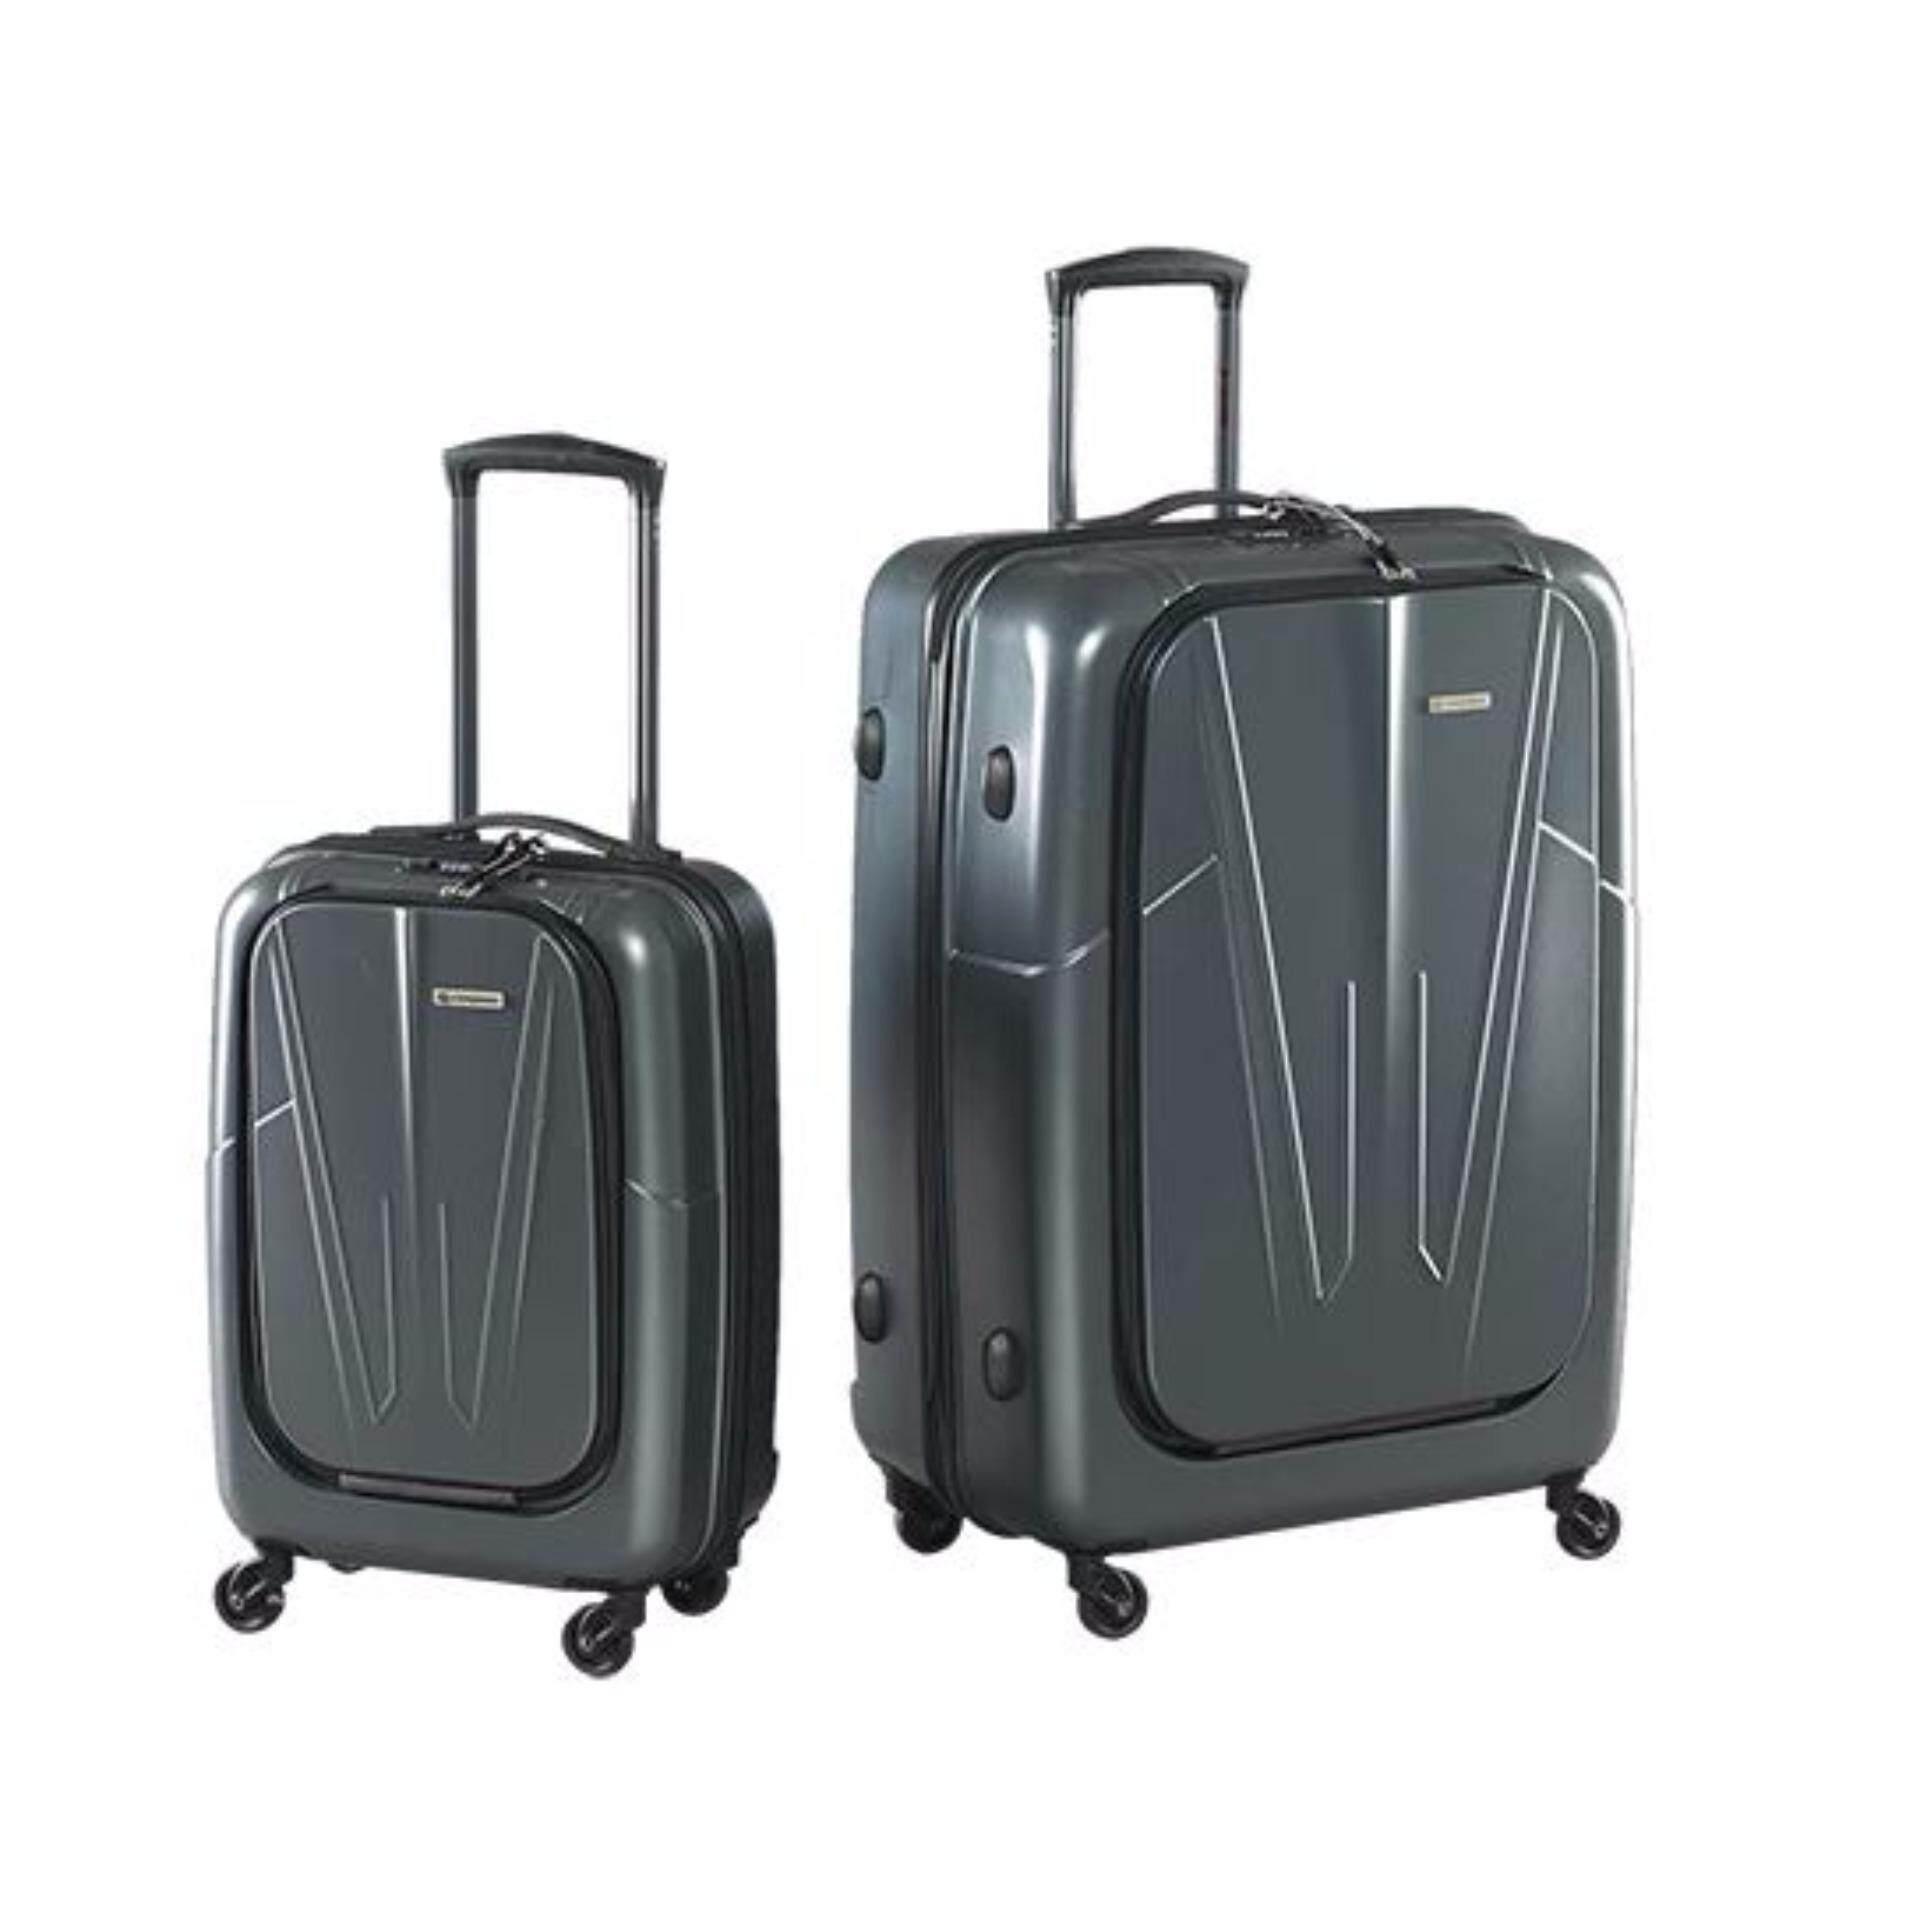 Caribee Mallorca Travel Backpack | Sabis